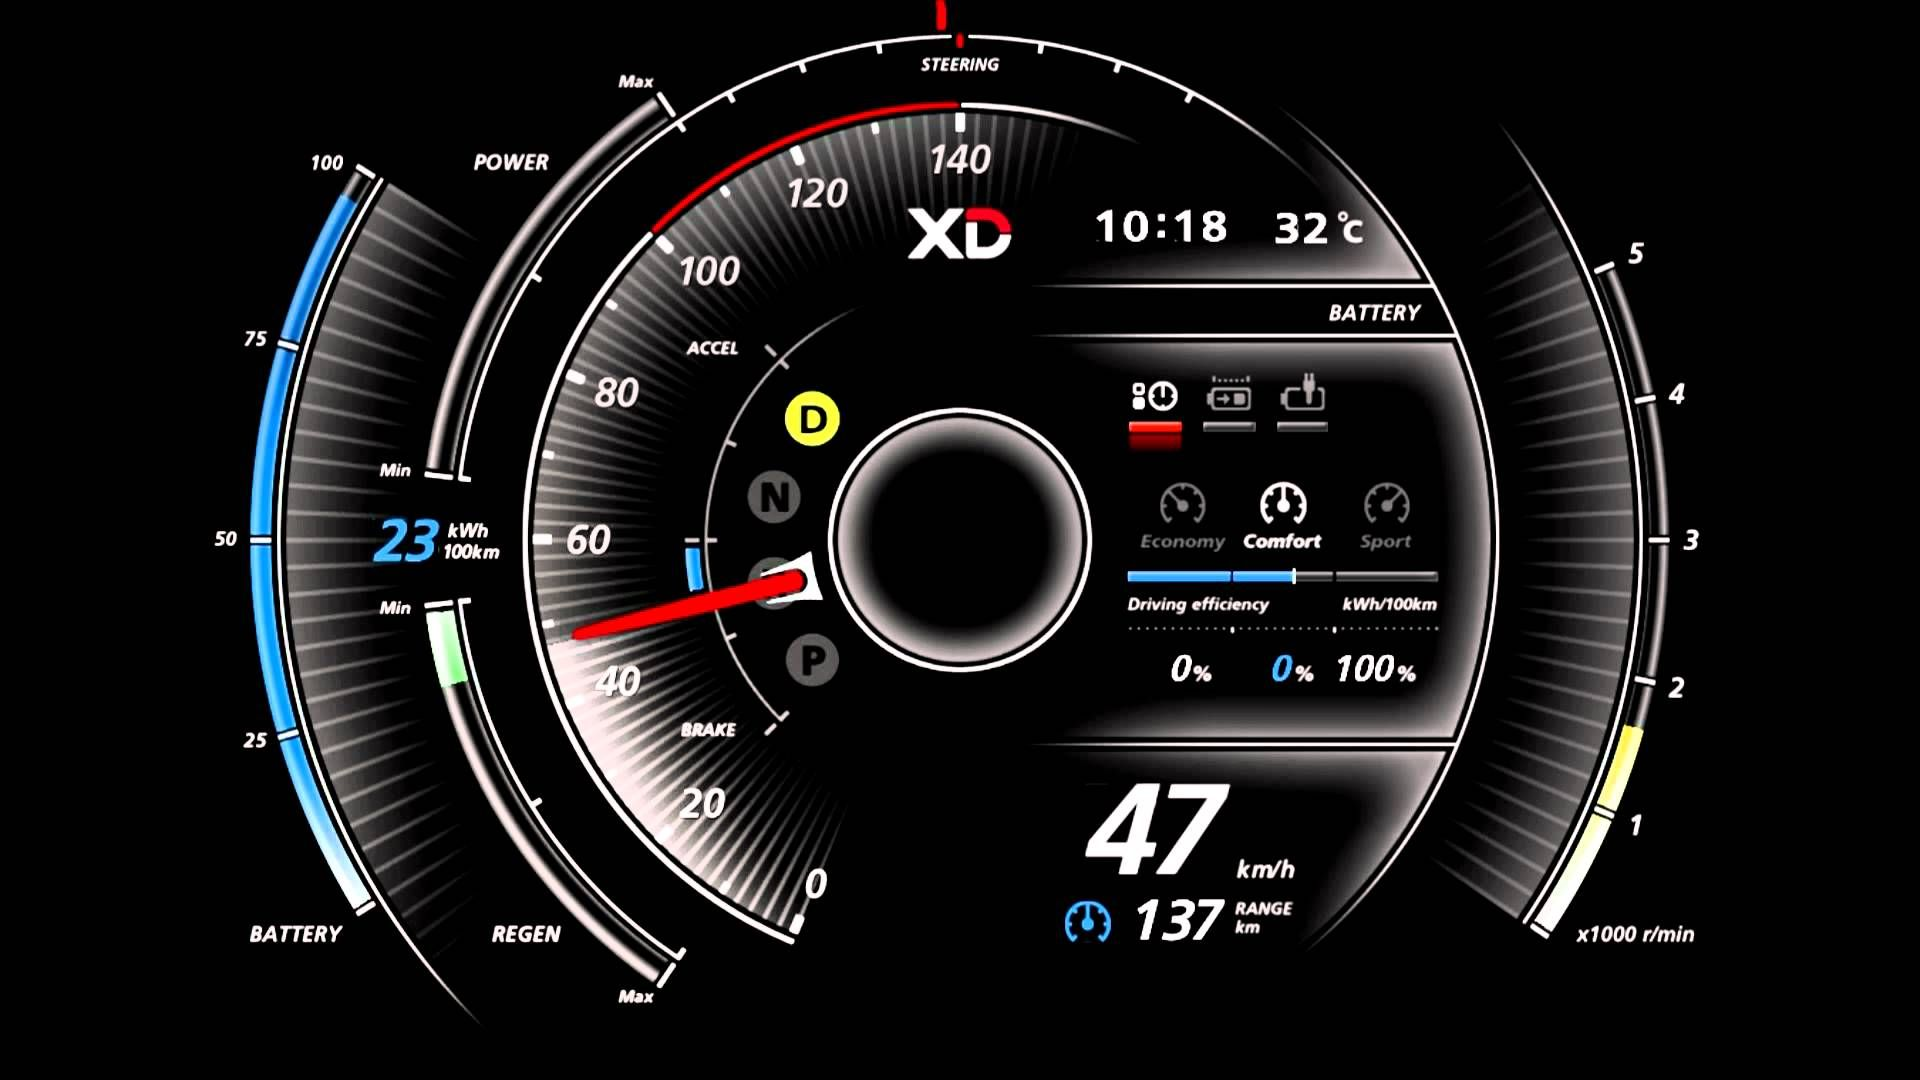 Pin On Automotive Ui